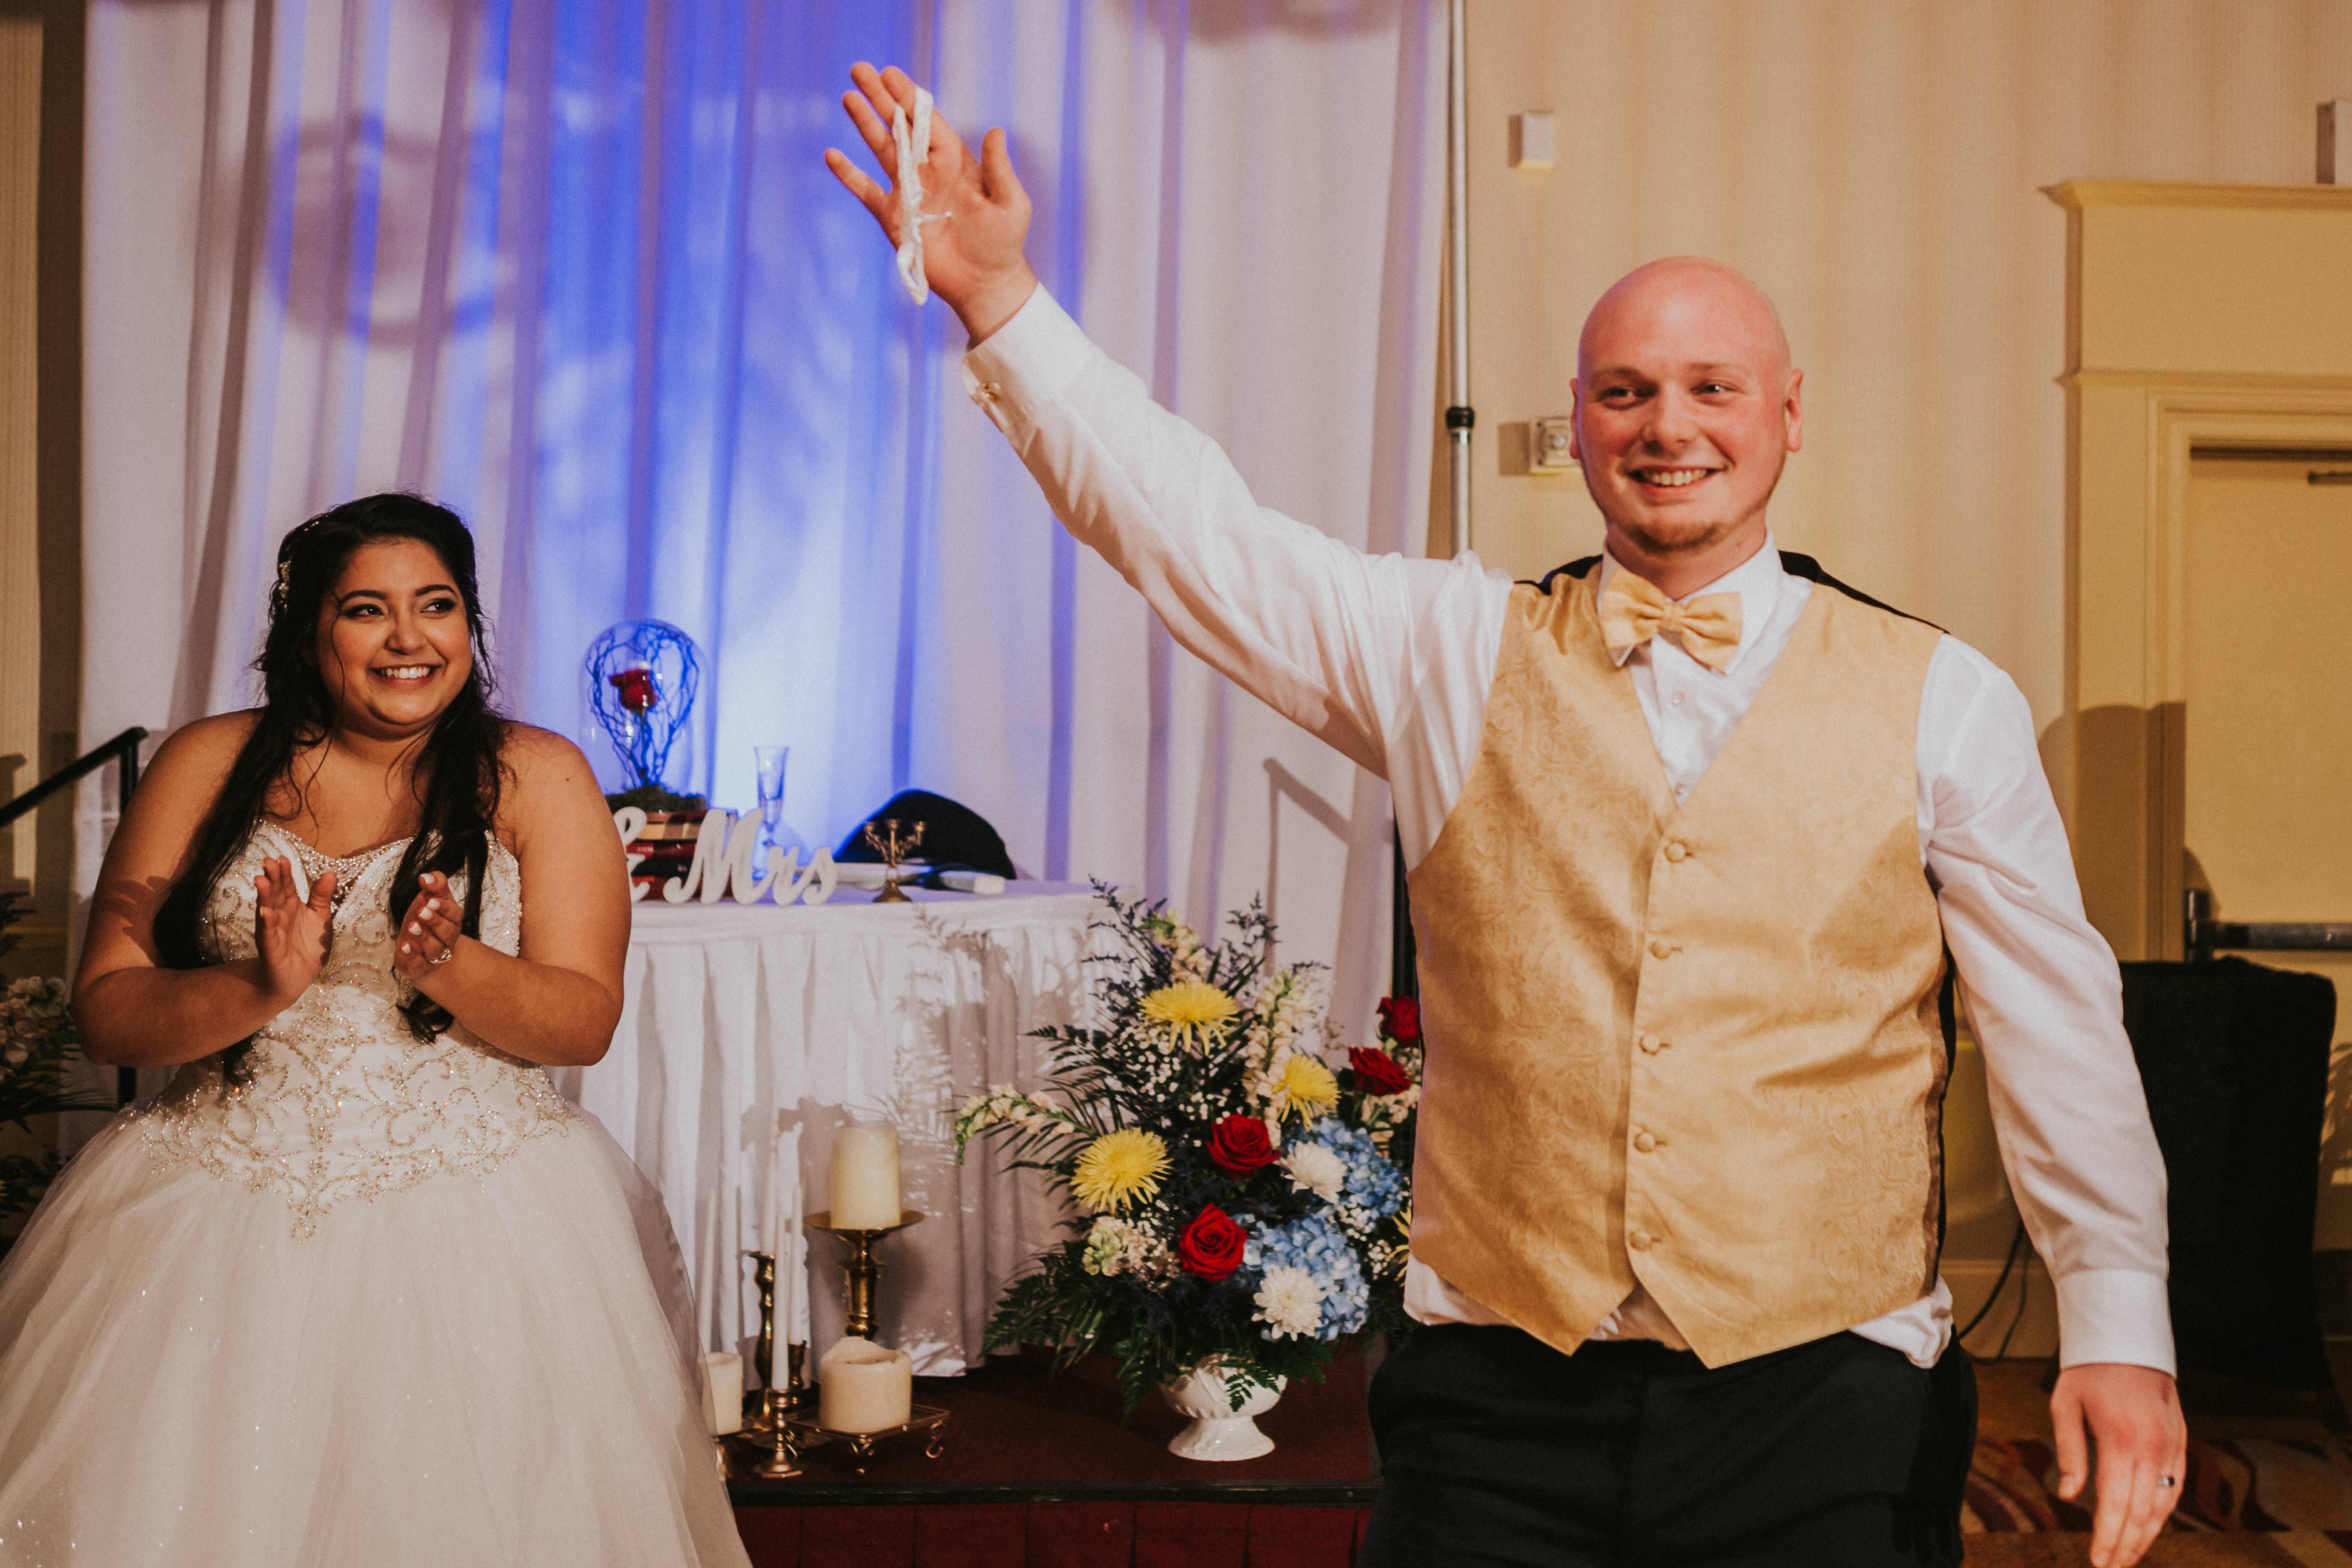 Barclay-Farmstead-Wedding-Rosa-and-Mike-815.jpg